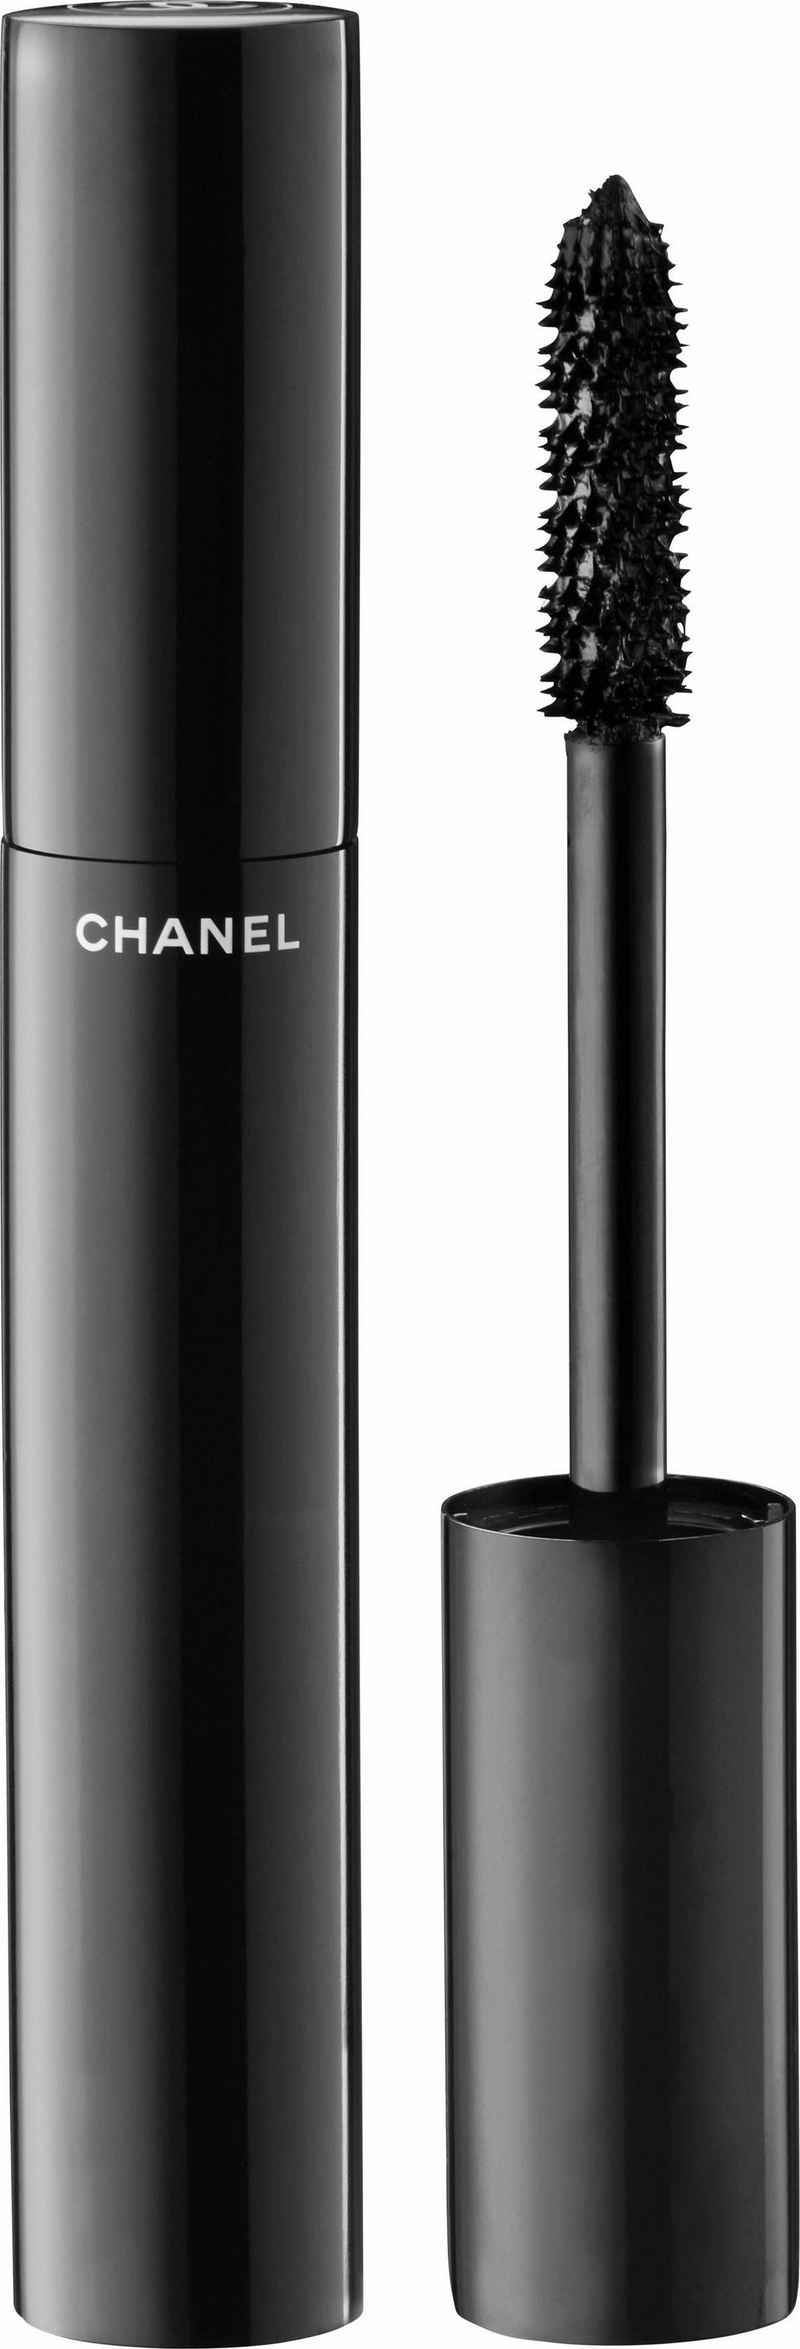 CHANEL Mascara »Le Volume de Chanel Waterproof«, Intensives Volumen